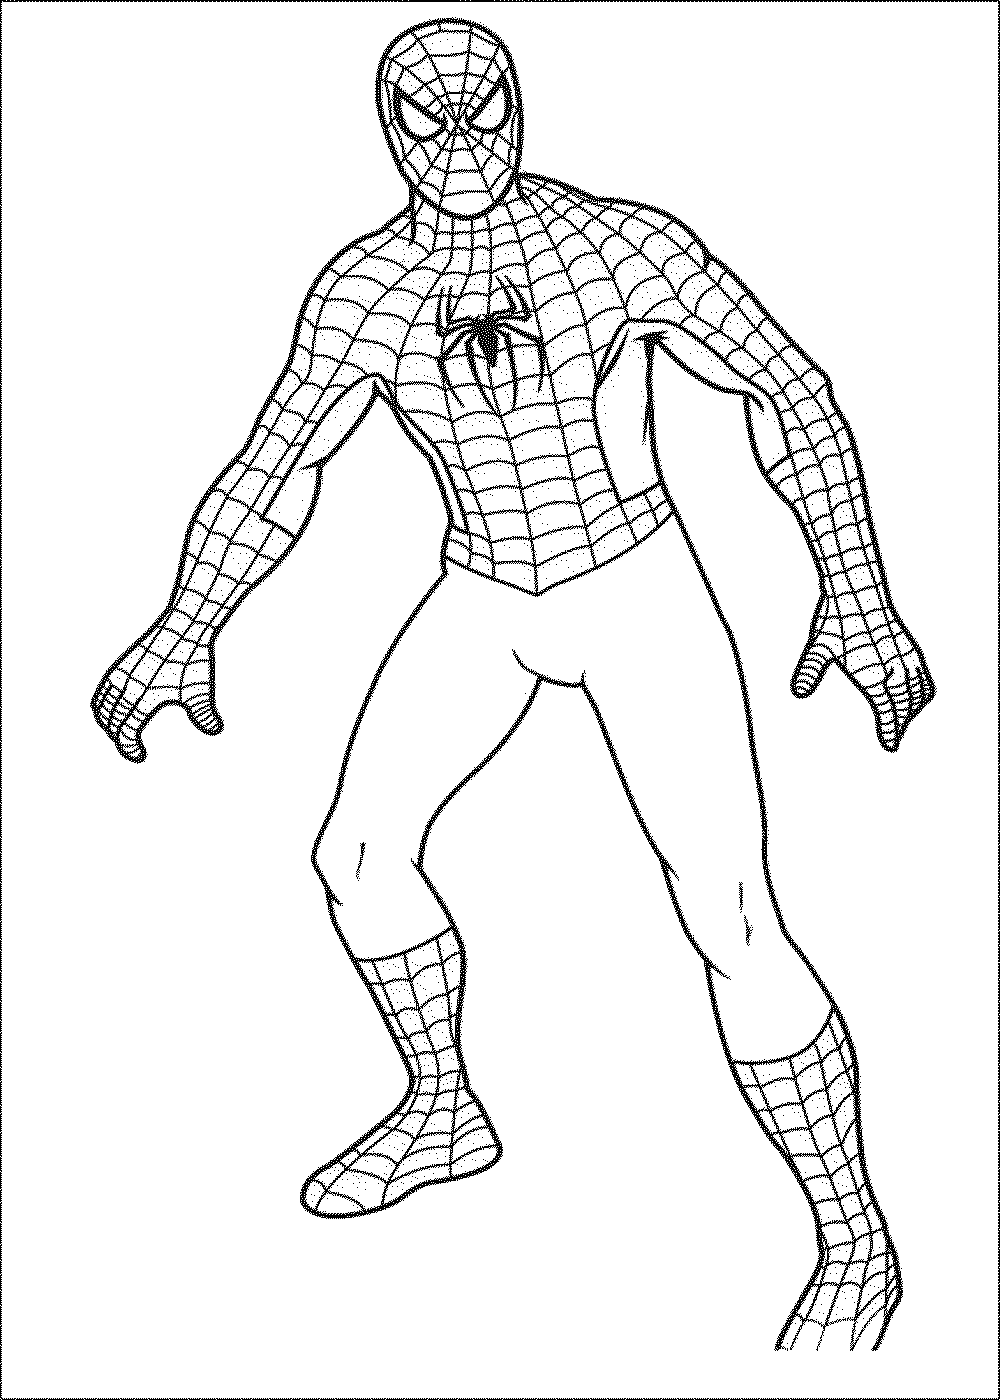 Simple Spiderman Coloring Pages Printable Kids Colouring Pages Spiderman Coloring Superhero Coloring Pages Super Coloring Pages